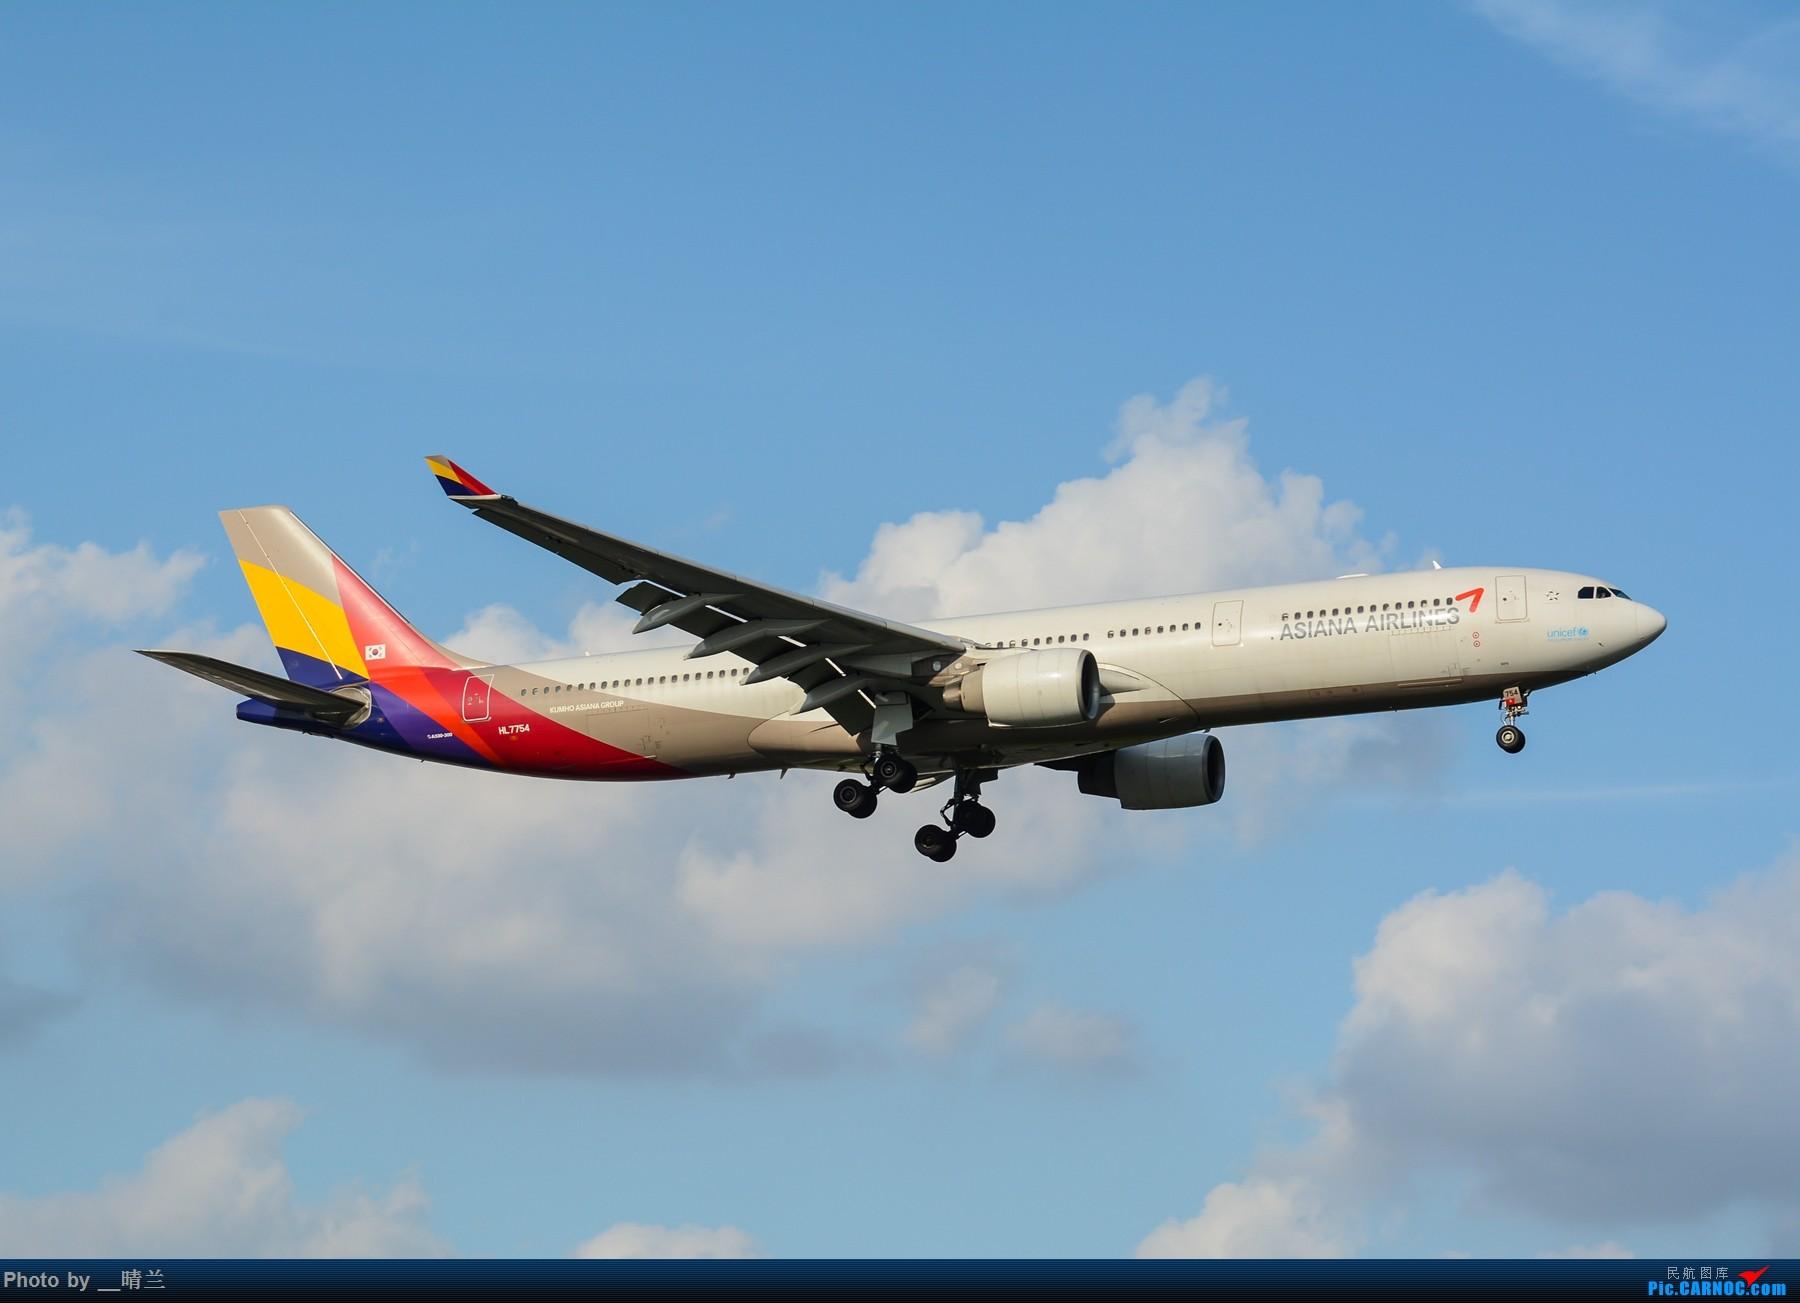 Re:[原创]果然昨天发了图,今天SHA就是大蓝天~~最开心的事莫过于基友们一起拍机! AIRBUS A330-300 HL7754 中国上海虹桥国际机场